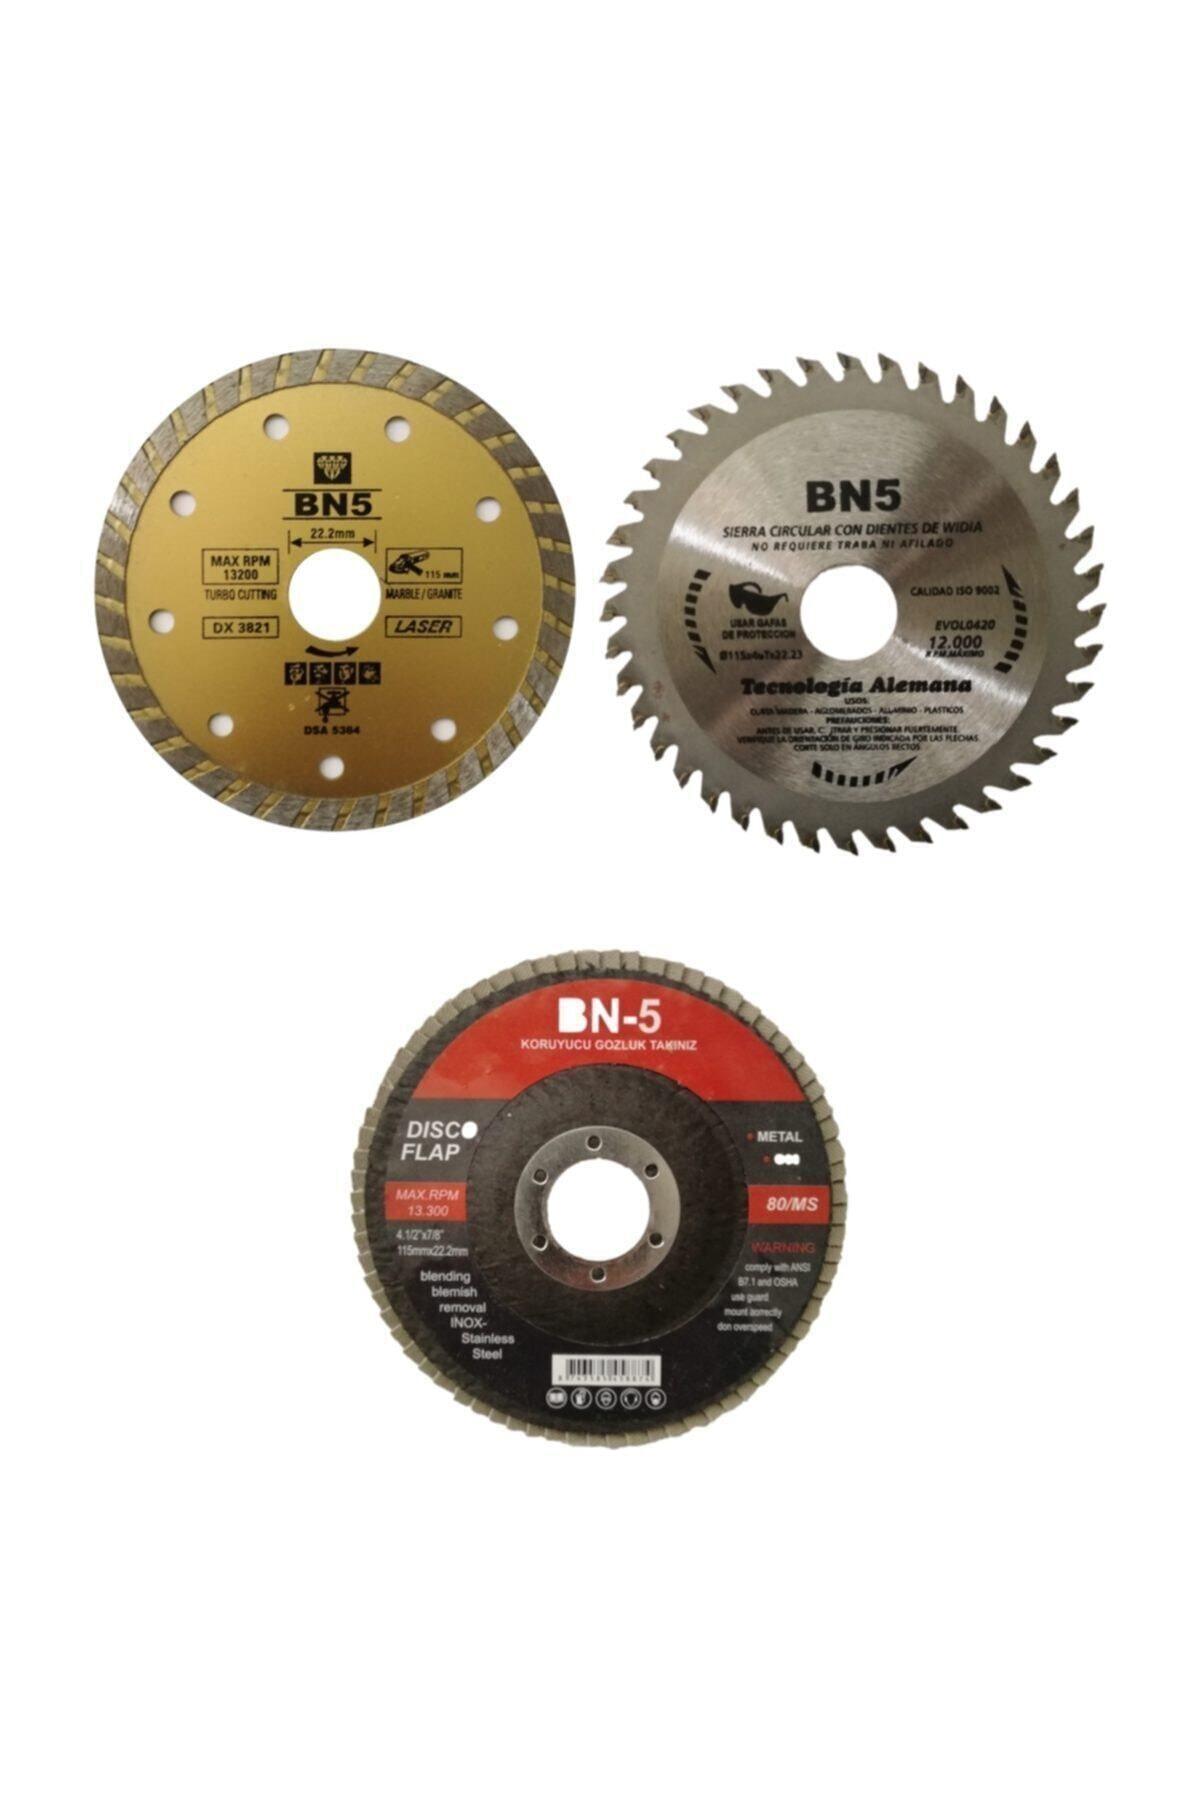 BN5 Ahşap Kesme Mermer Fayans Kesici 60 Kum Zımpara 115 Mm 3lü Disk Seti 1